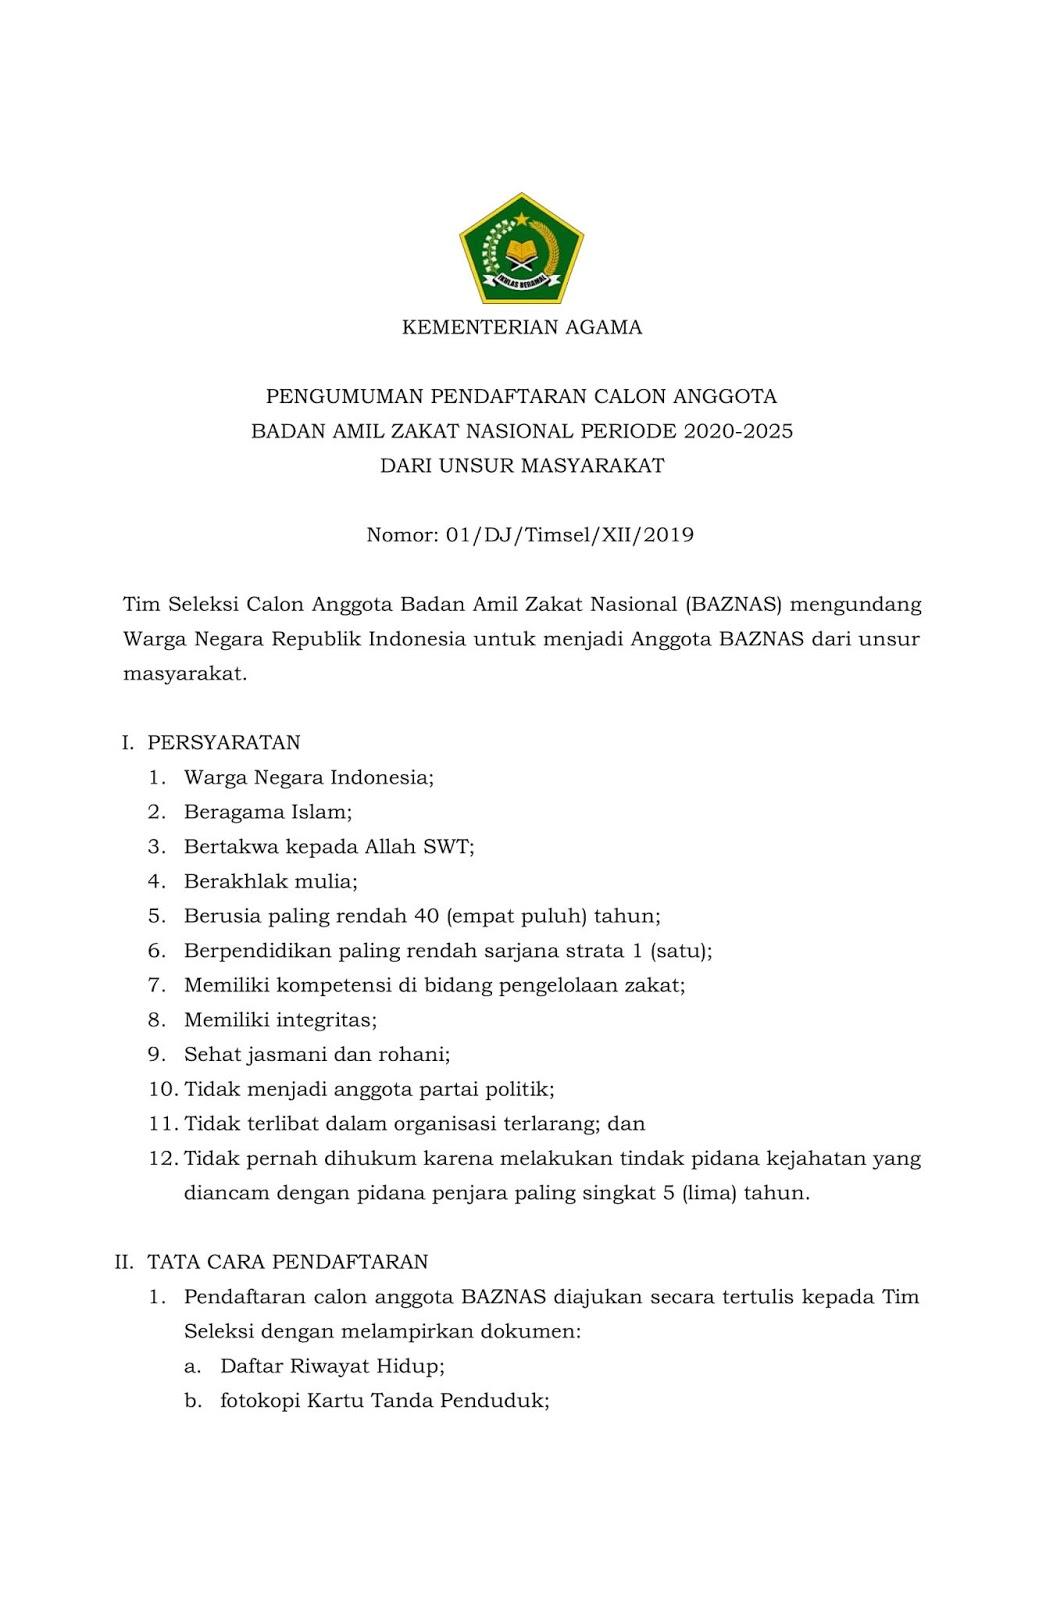 Rekrutmen Baznas Kementerian Agama Republik Indonesia Bulan Desember 2019